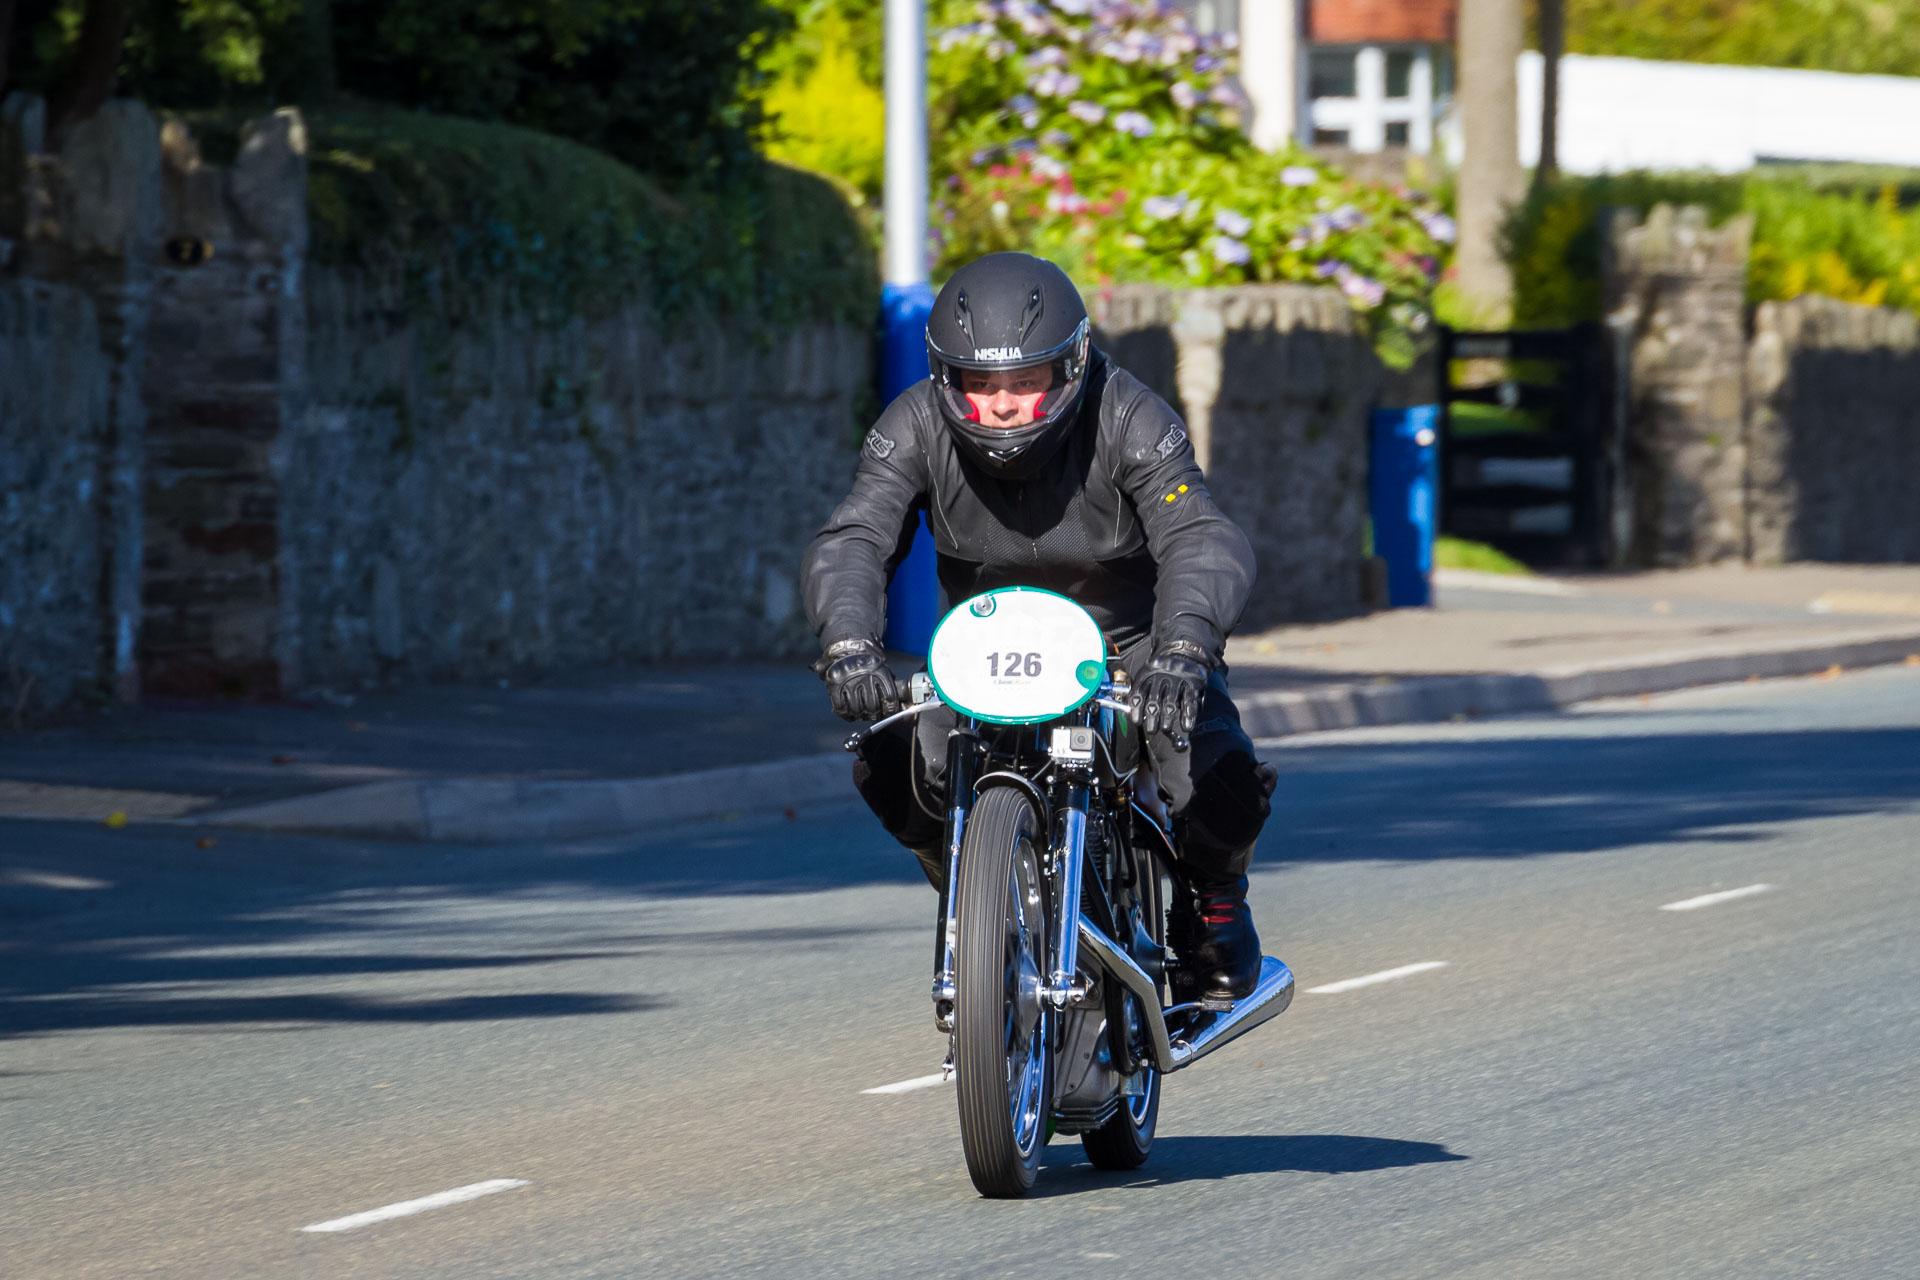 Jens auf der AWO RS 250/1 kurz vor dem Ziel in Douglas. Foto: Krause/MotorPhoto.de